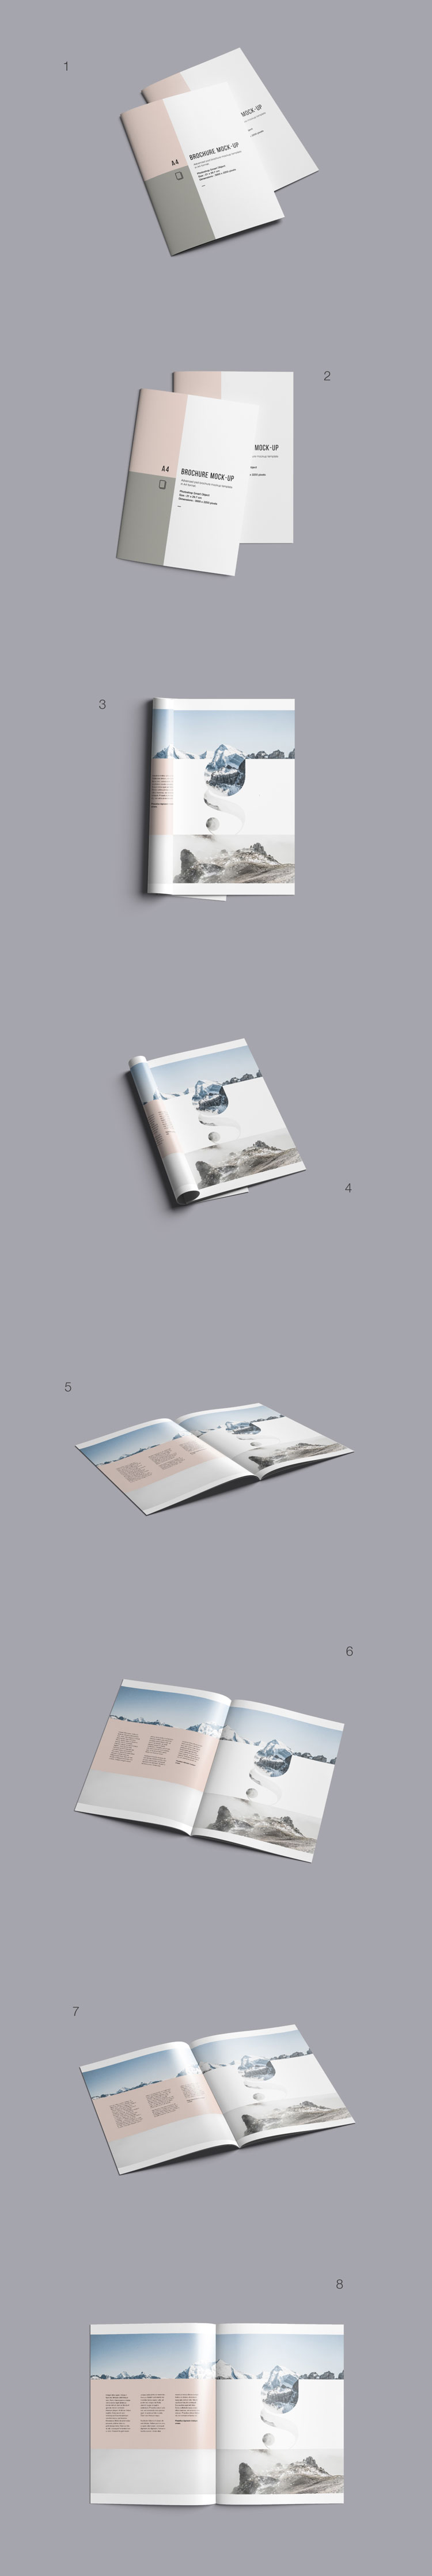 Free Advance A4 Brochure Mockup